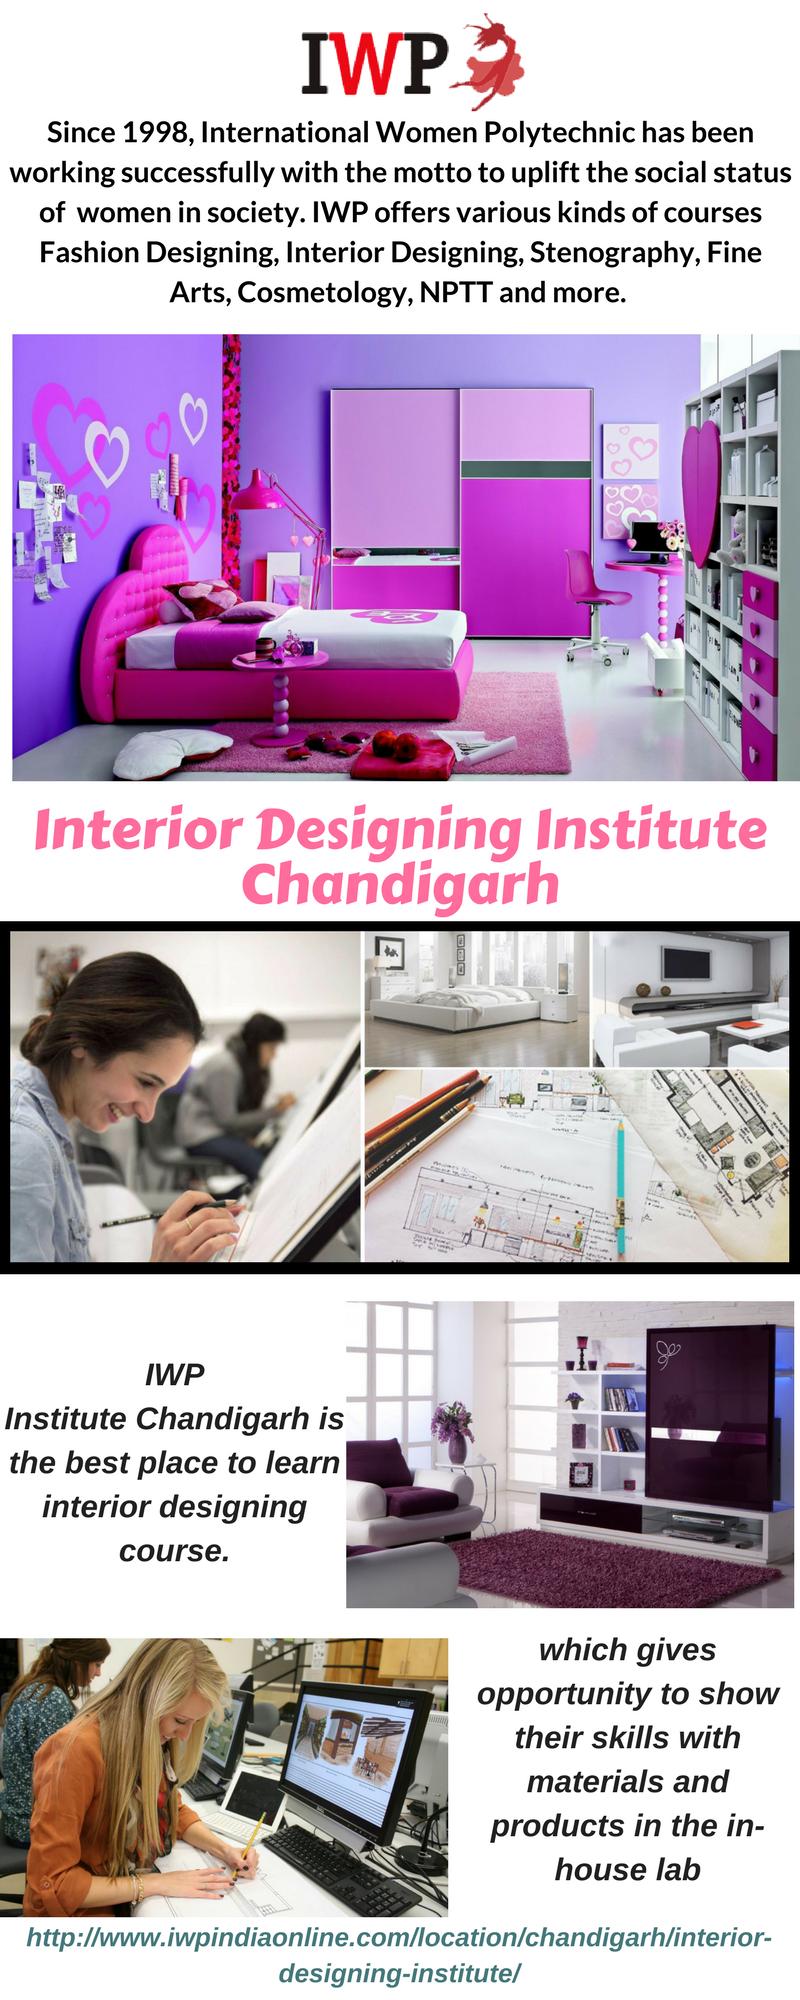 Interior Designing Institute Chandigarh Https I Redd It Mwdbgjkbzyb01 Png Interior Design Student Wellness Design Fashion Designing Course